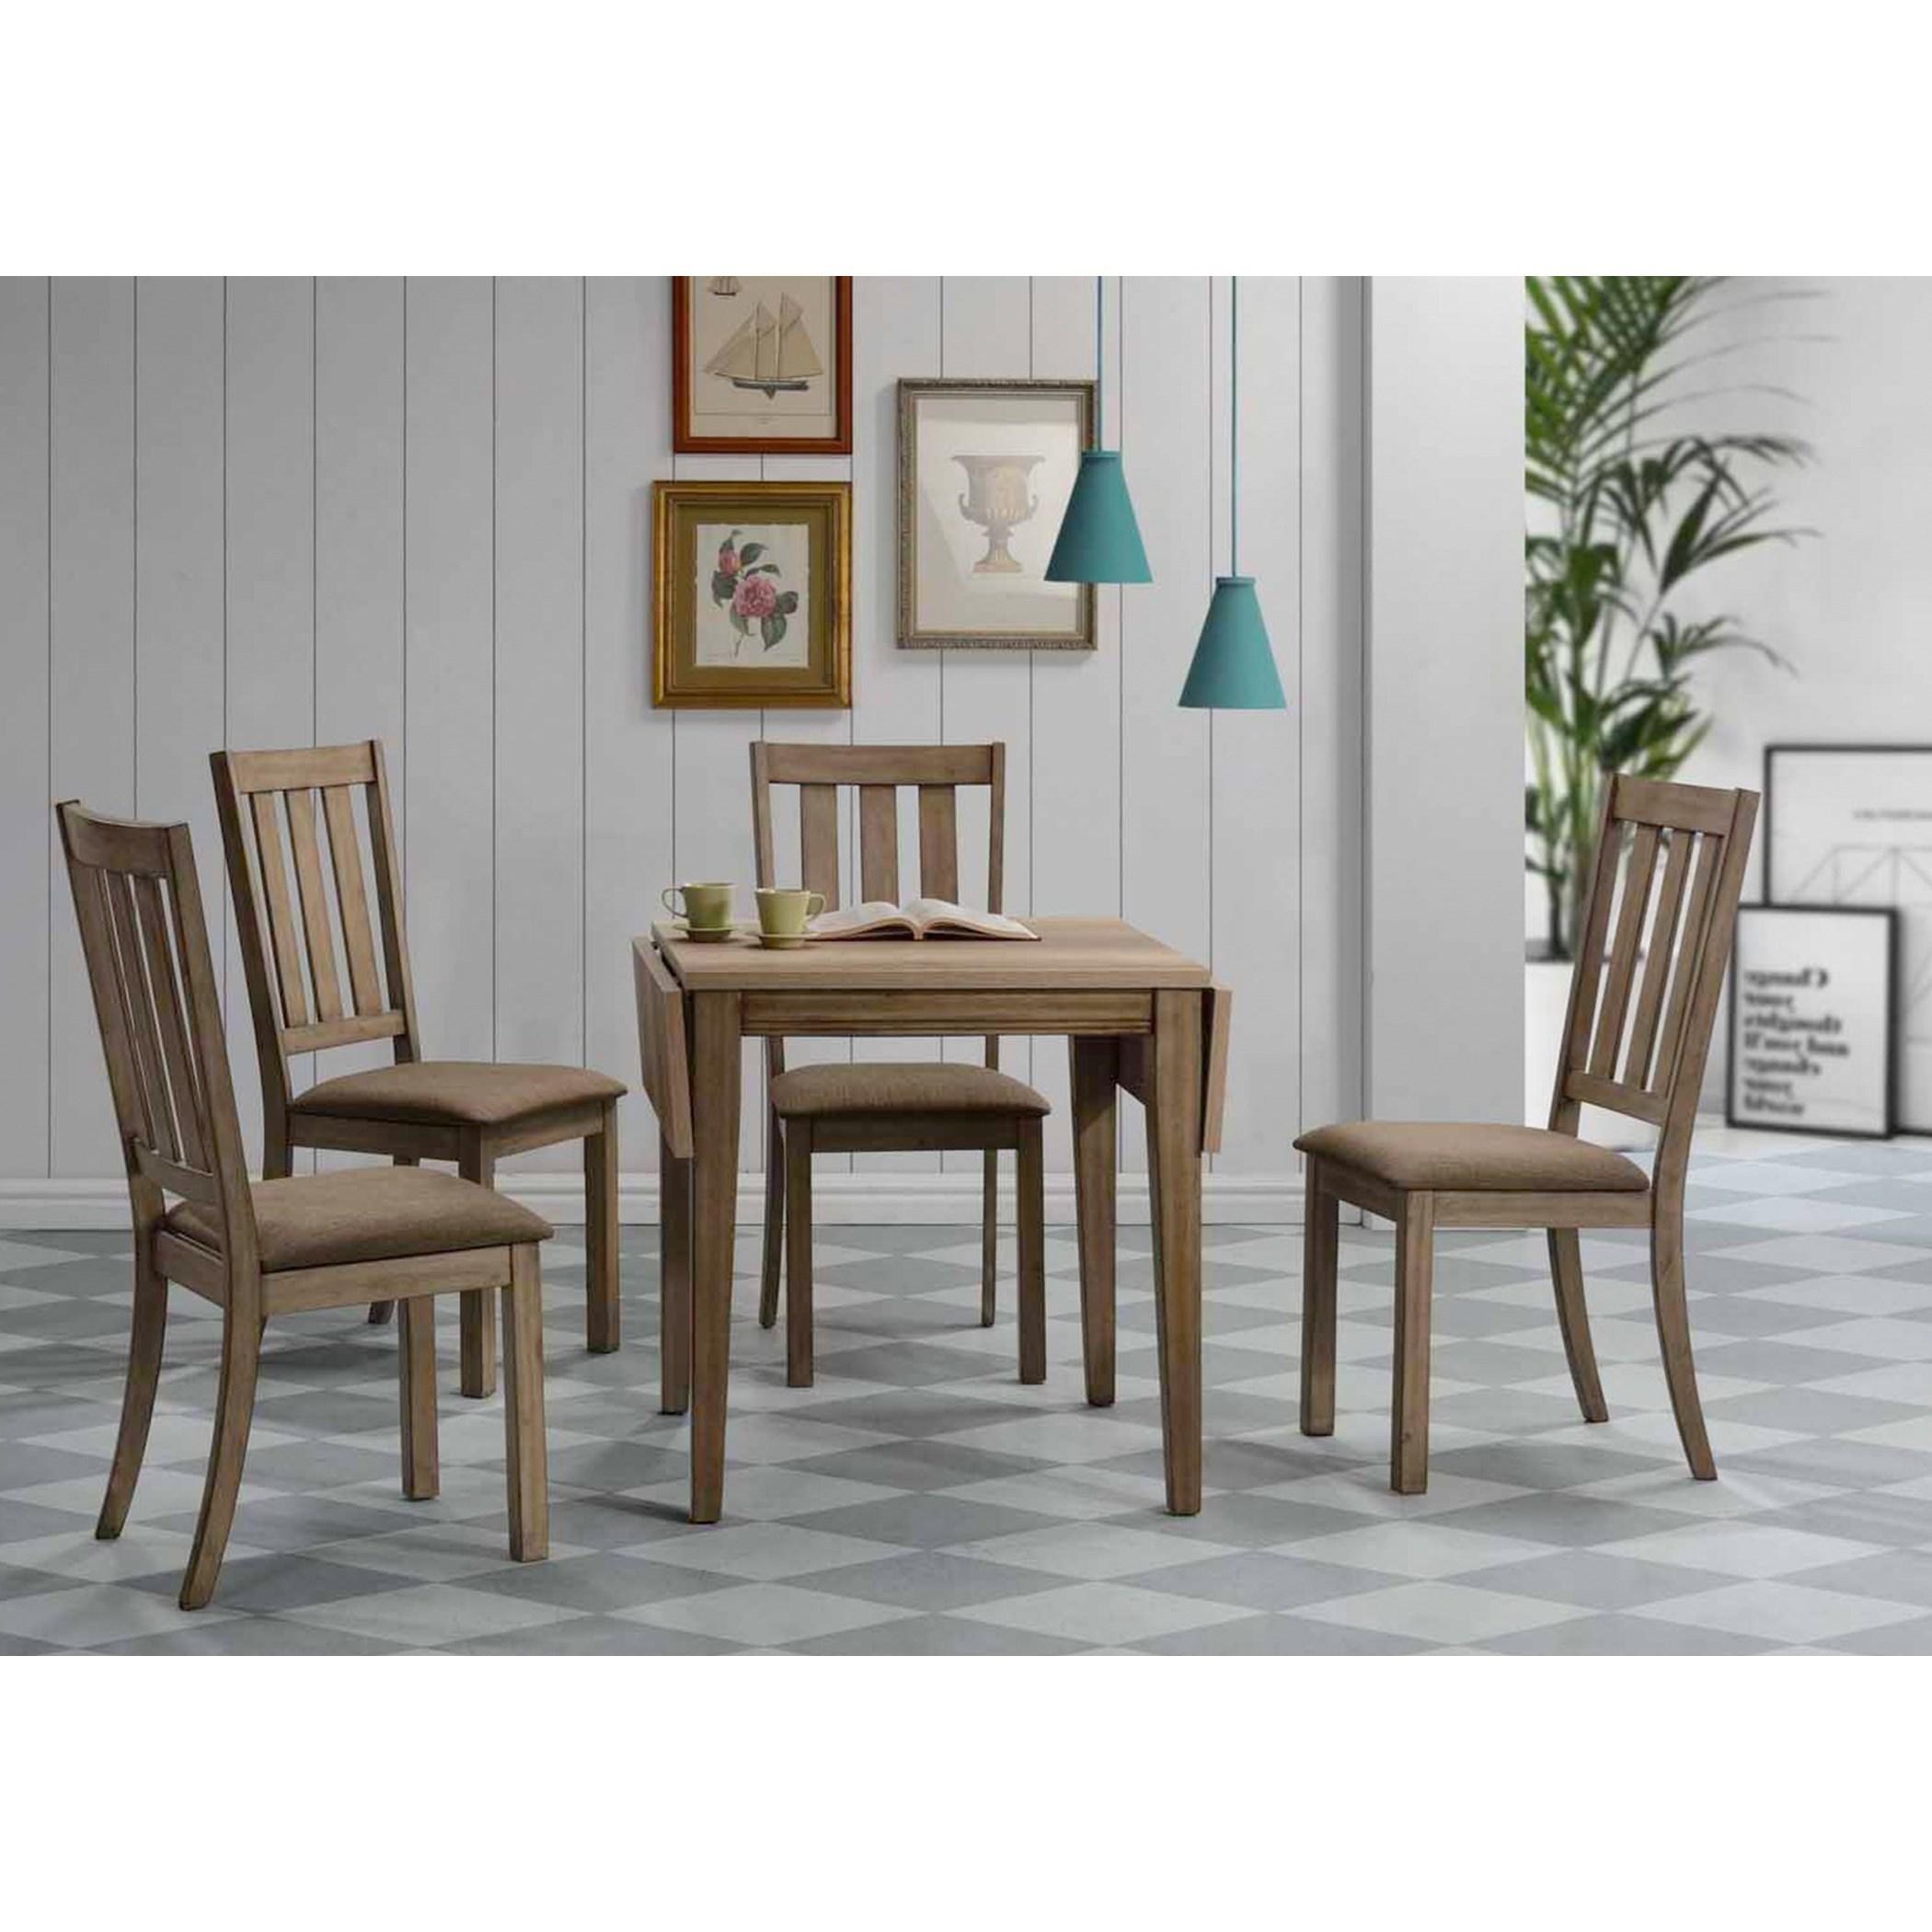 Liberty Furniture Sun Valley 5 Piece Drop Leaf Set W/ Slat Back Chairs